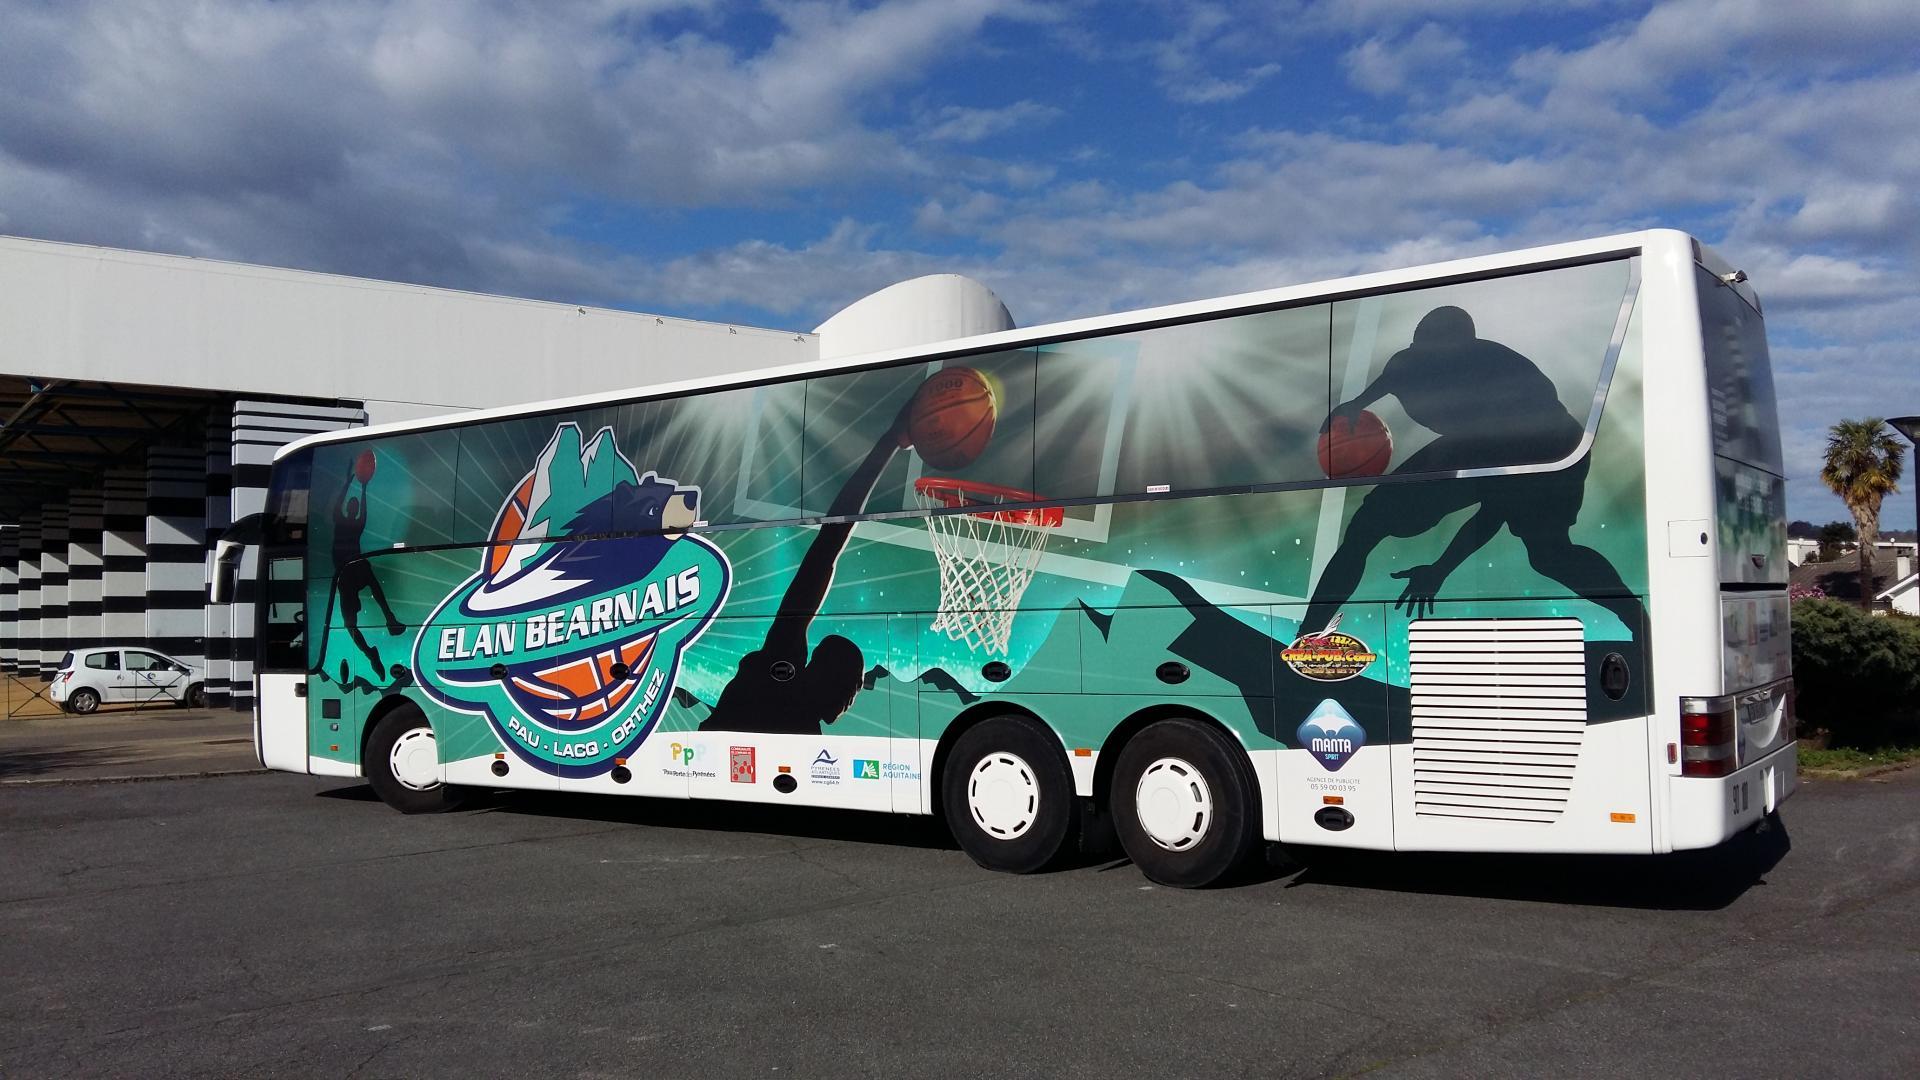 So Bus : Possible de visiter l'hexagone en bus ?